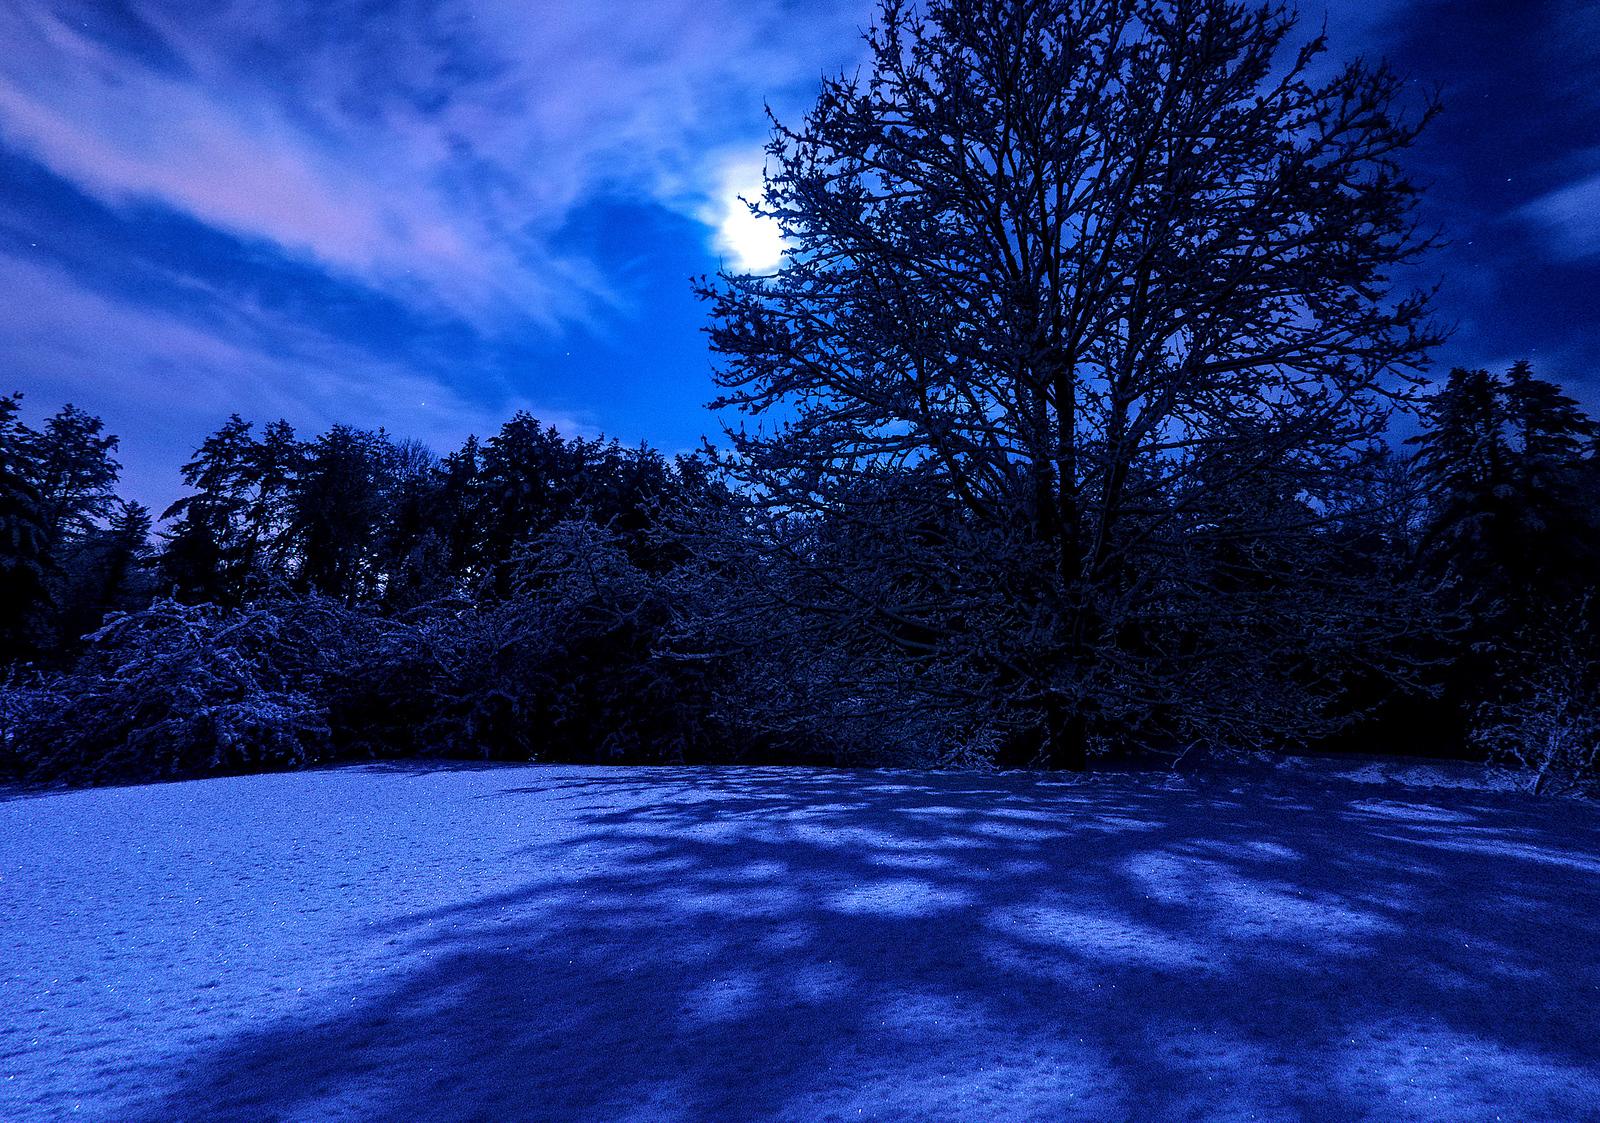 Moonlight and fresh snow